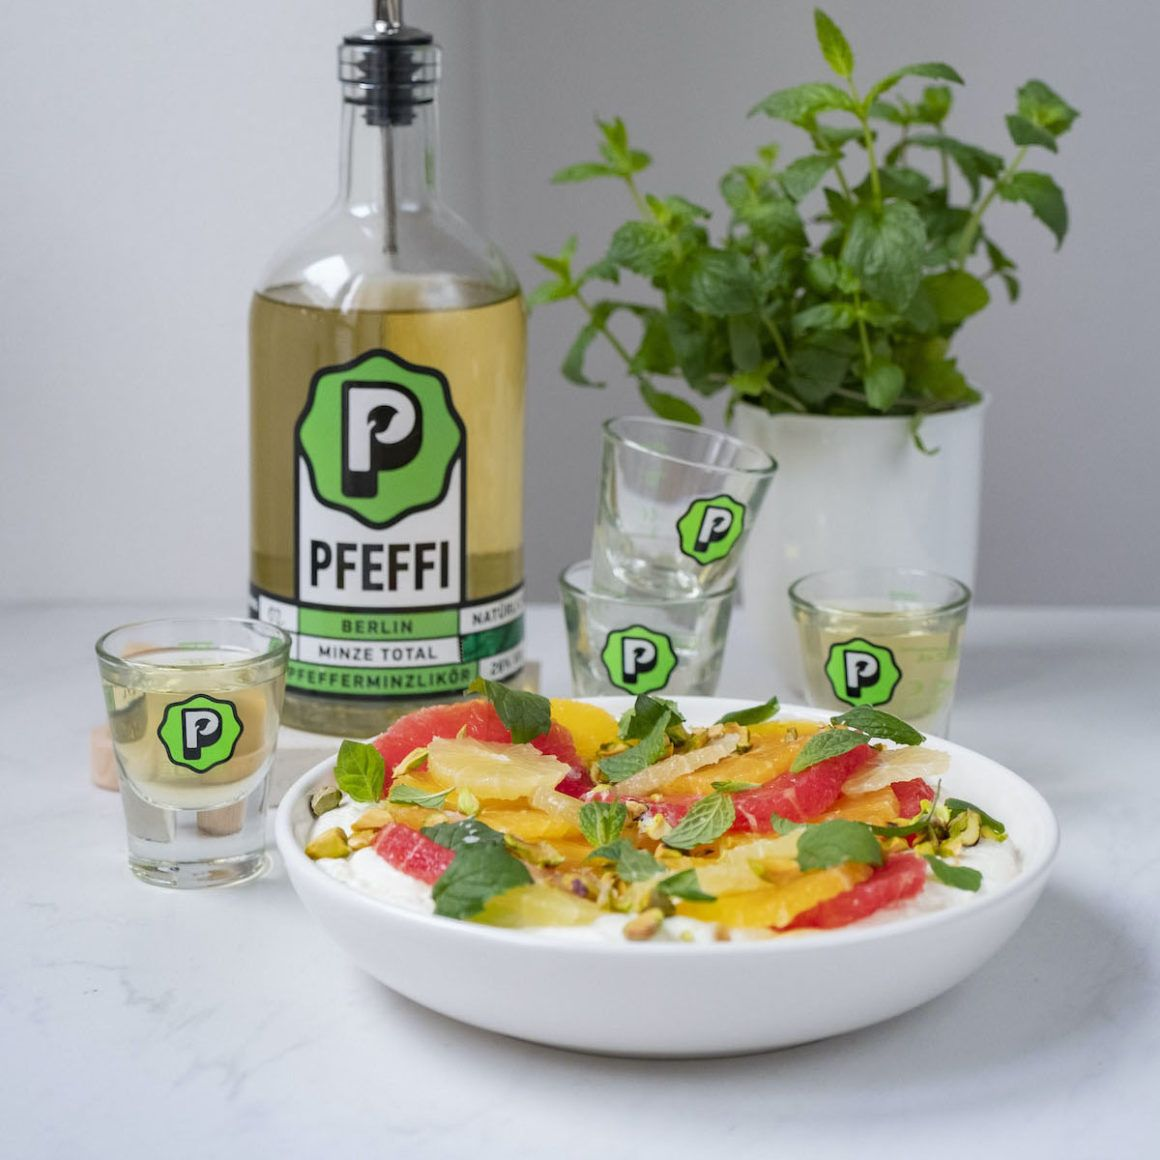 About Fuel, Foodblog, Pfeffi Berlin, Minze, Orange, Pink Grapefruit_1